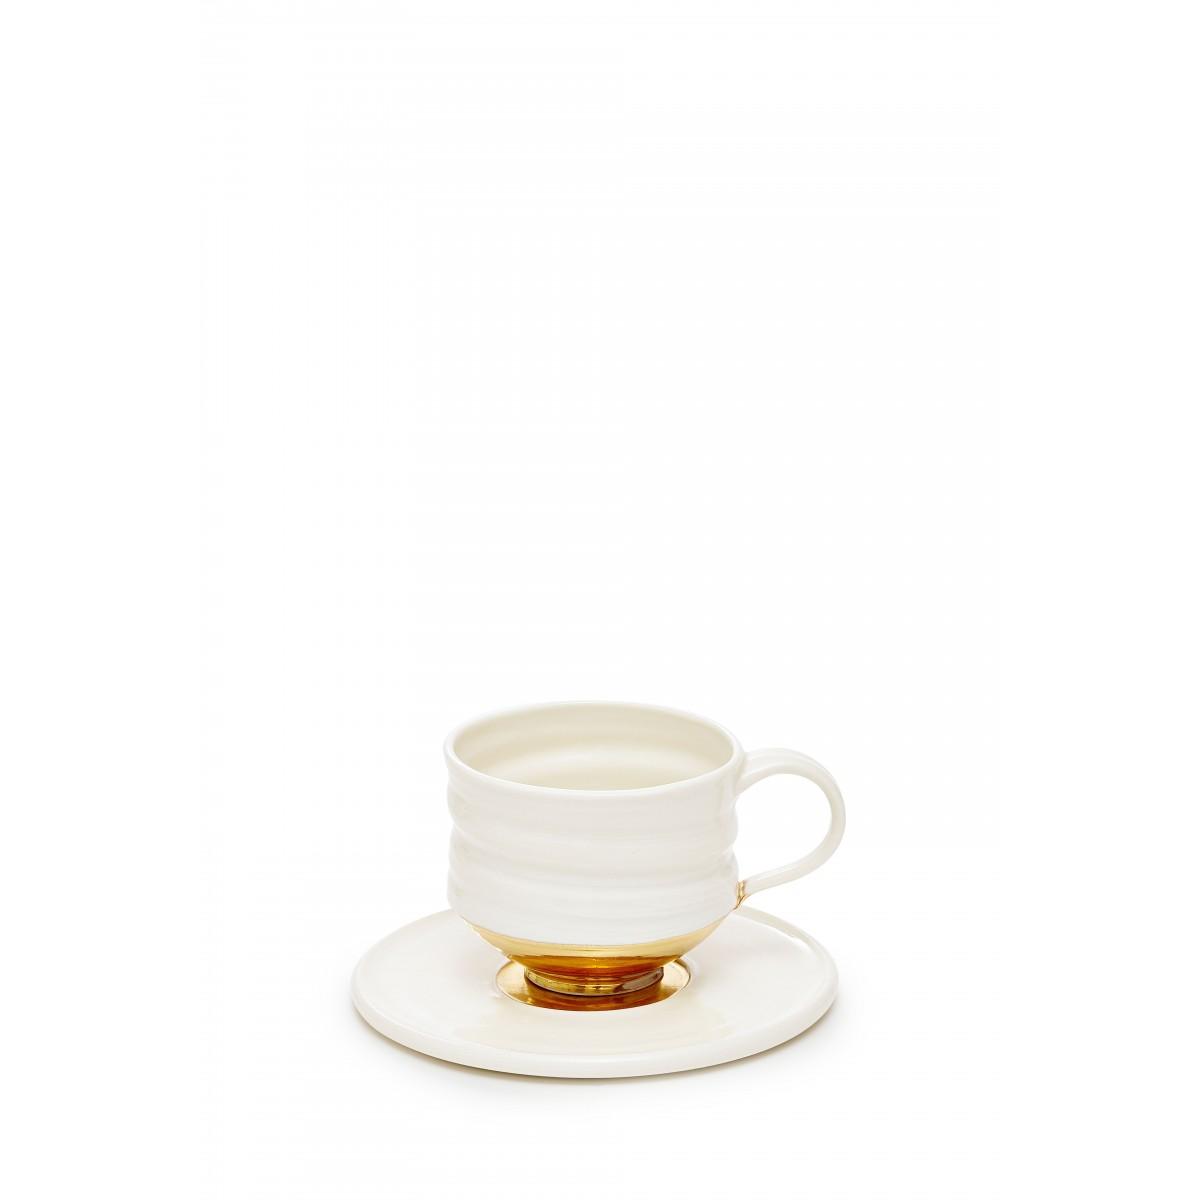 Annika Schüler - porcelain Porzellantasse, Unterteller (gold)